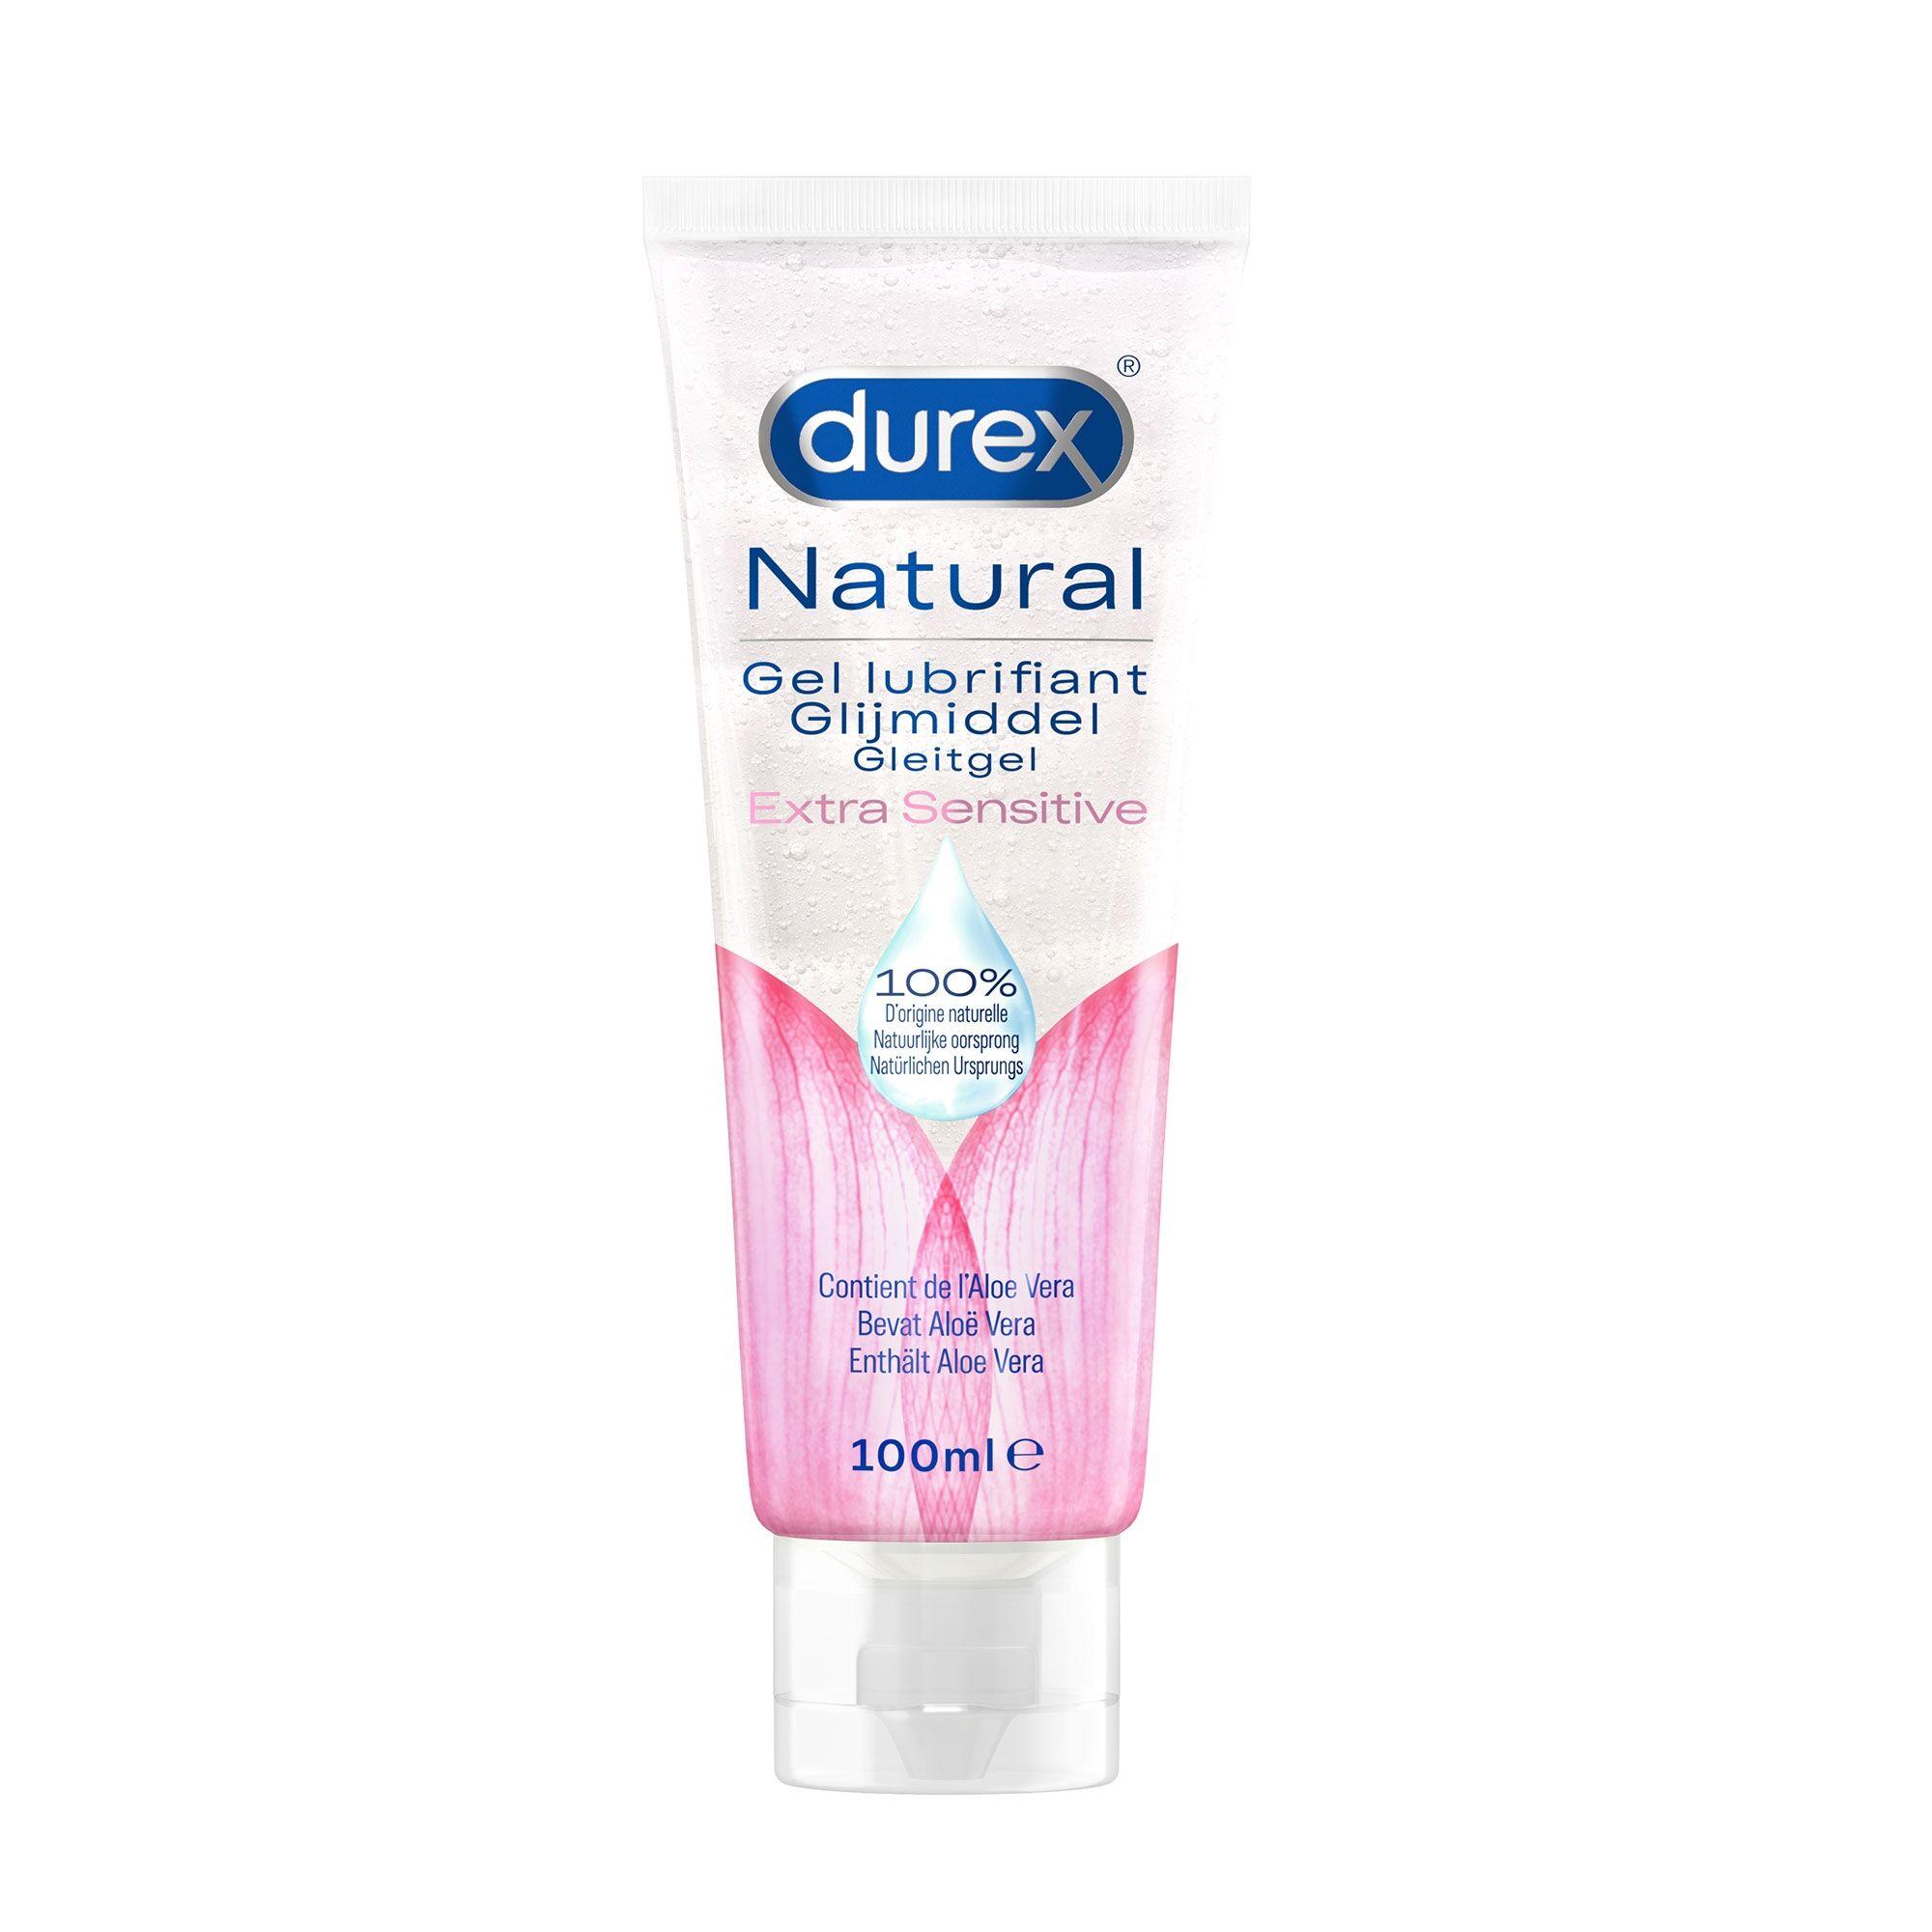 Durex Gel Lubrifiant Naturel Extra Sensitive 100 ml